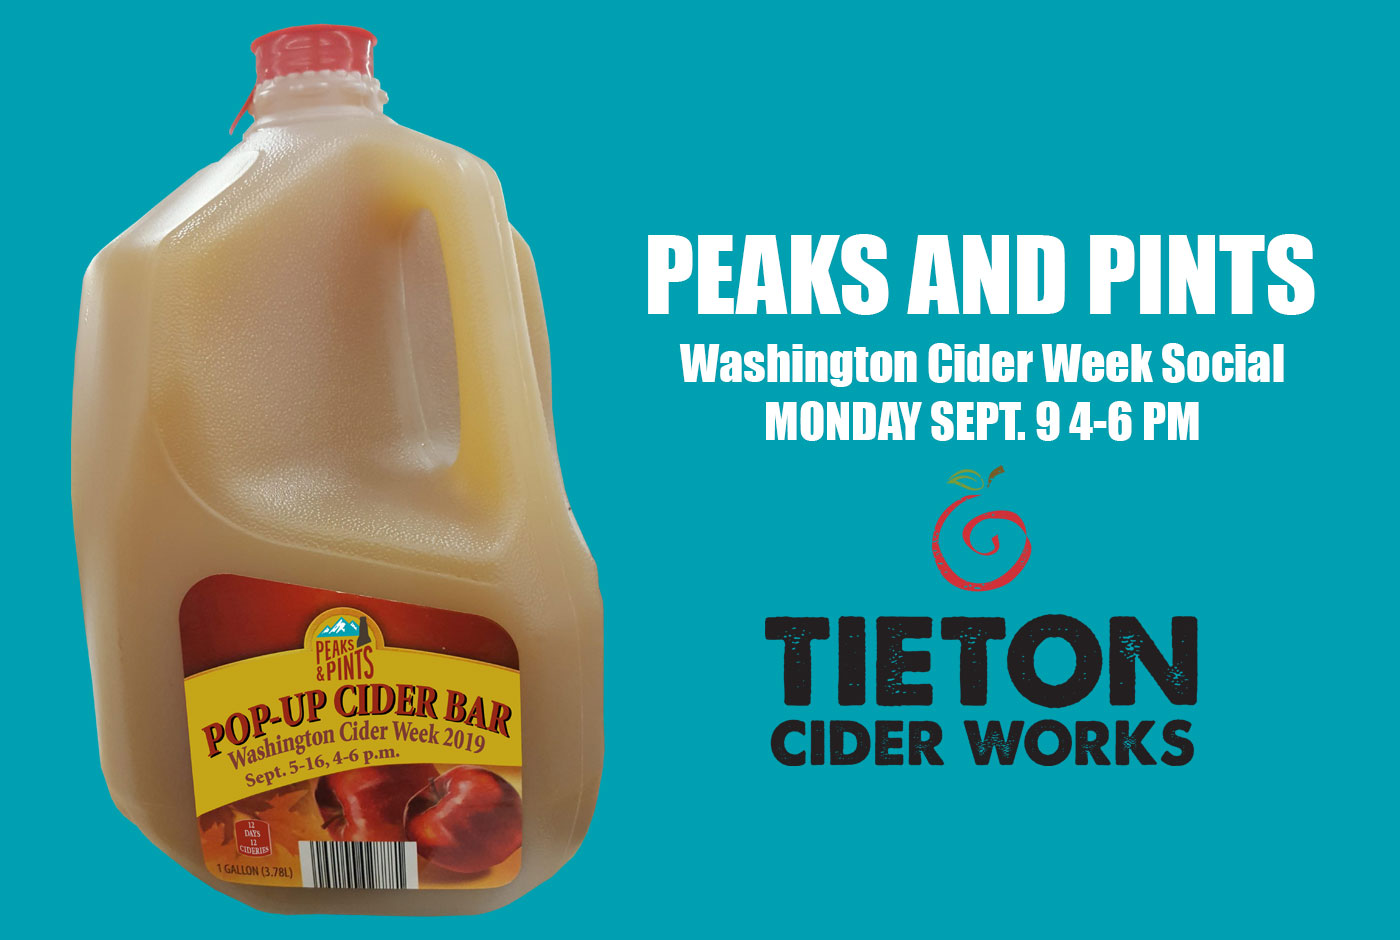 Peaks-and-Pints-Washington-Cider-Week-Social-Tieton-Calendar